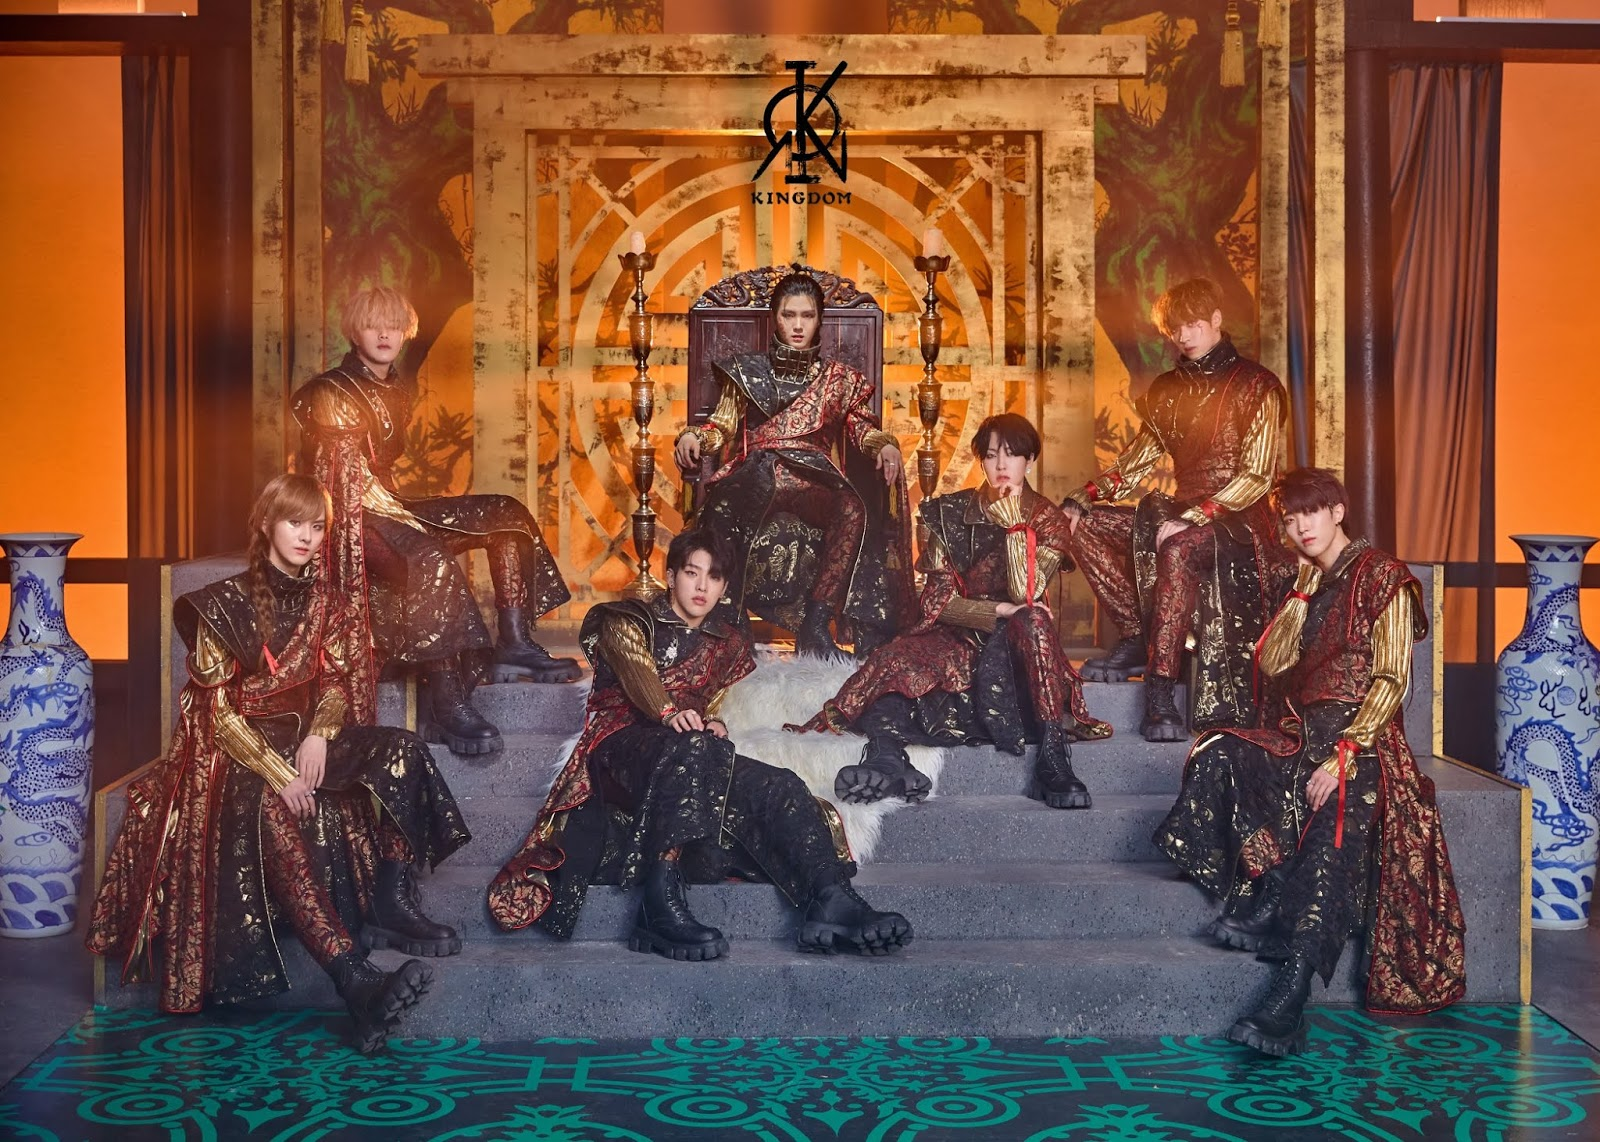 Kingdom hace comeback con History of Kingdom 2021